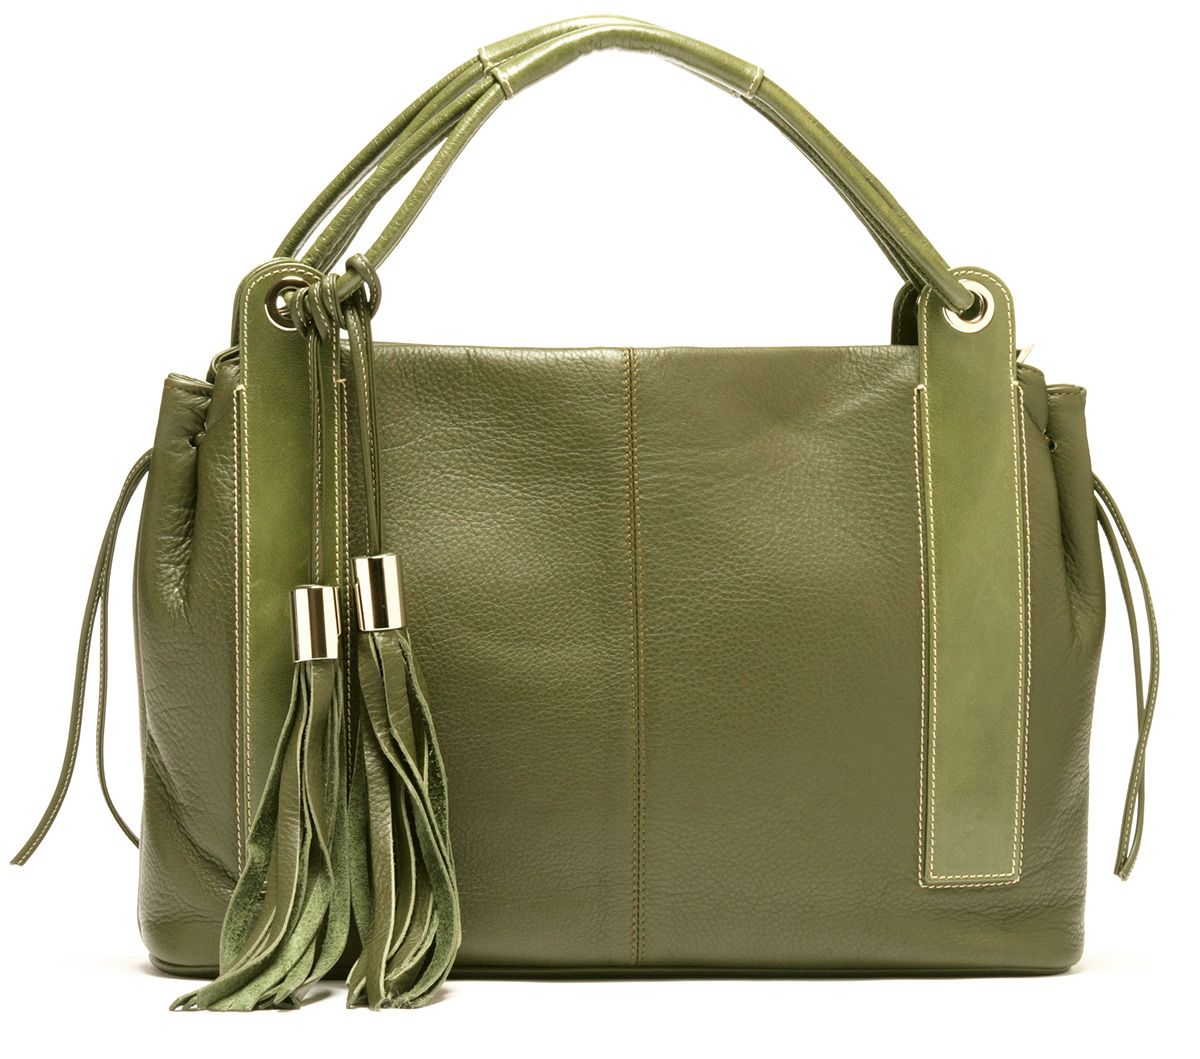 Roma Italian Handbag With Tassels In Olive Green At Zia Moda